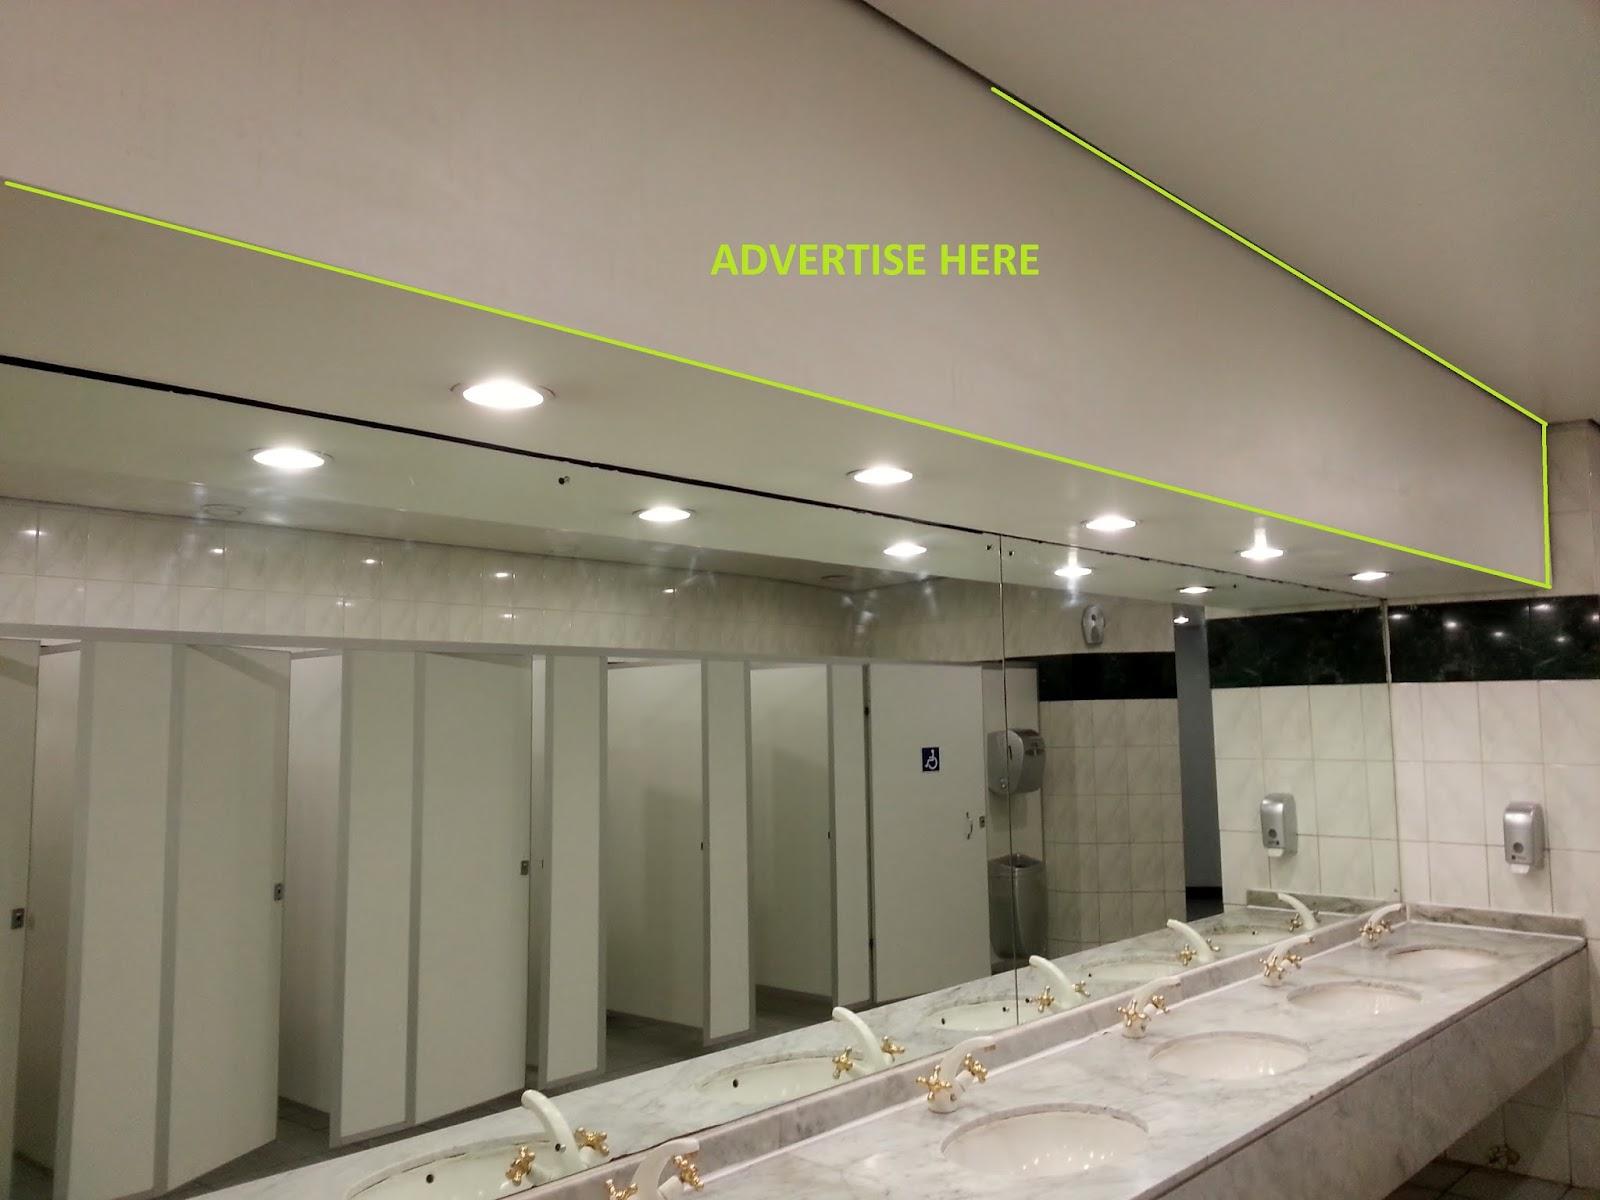 BathroomAboveMirrors.jpg